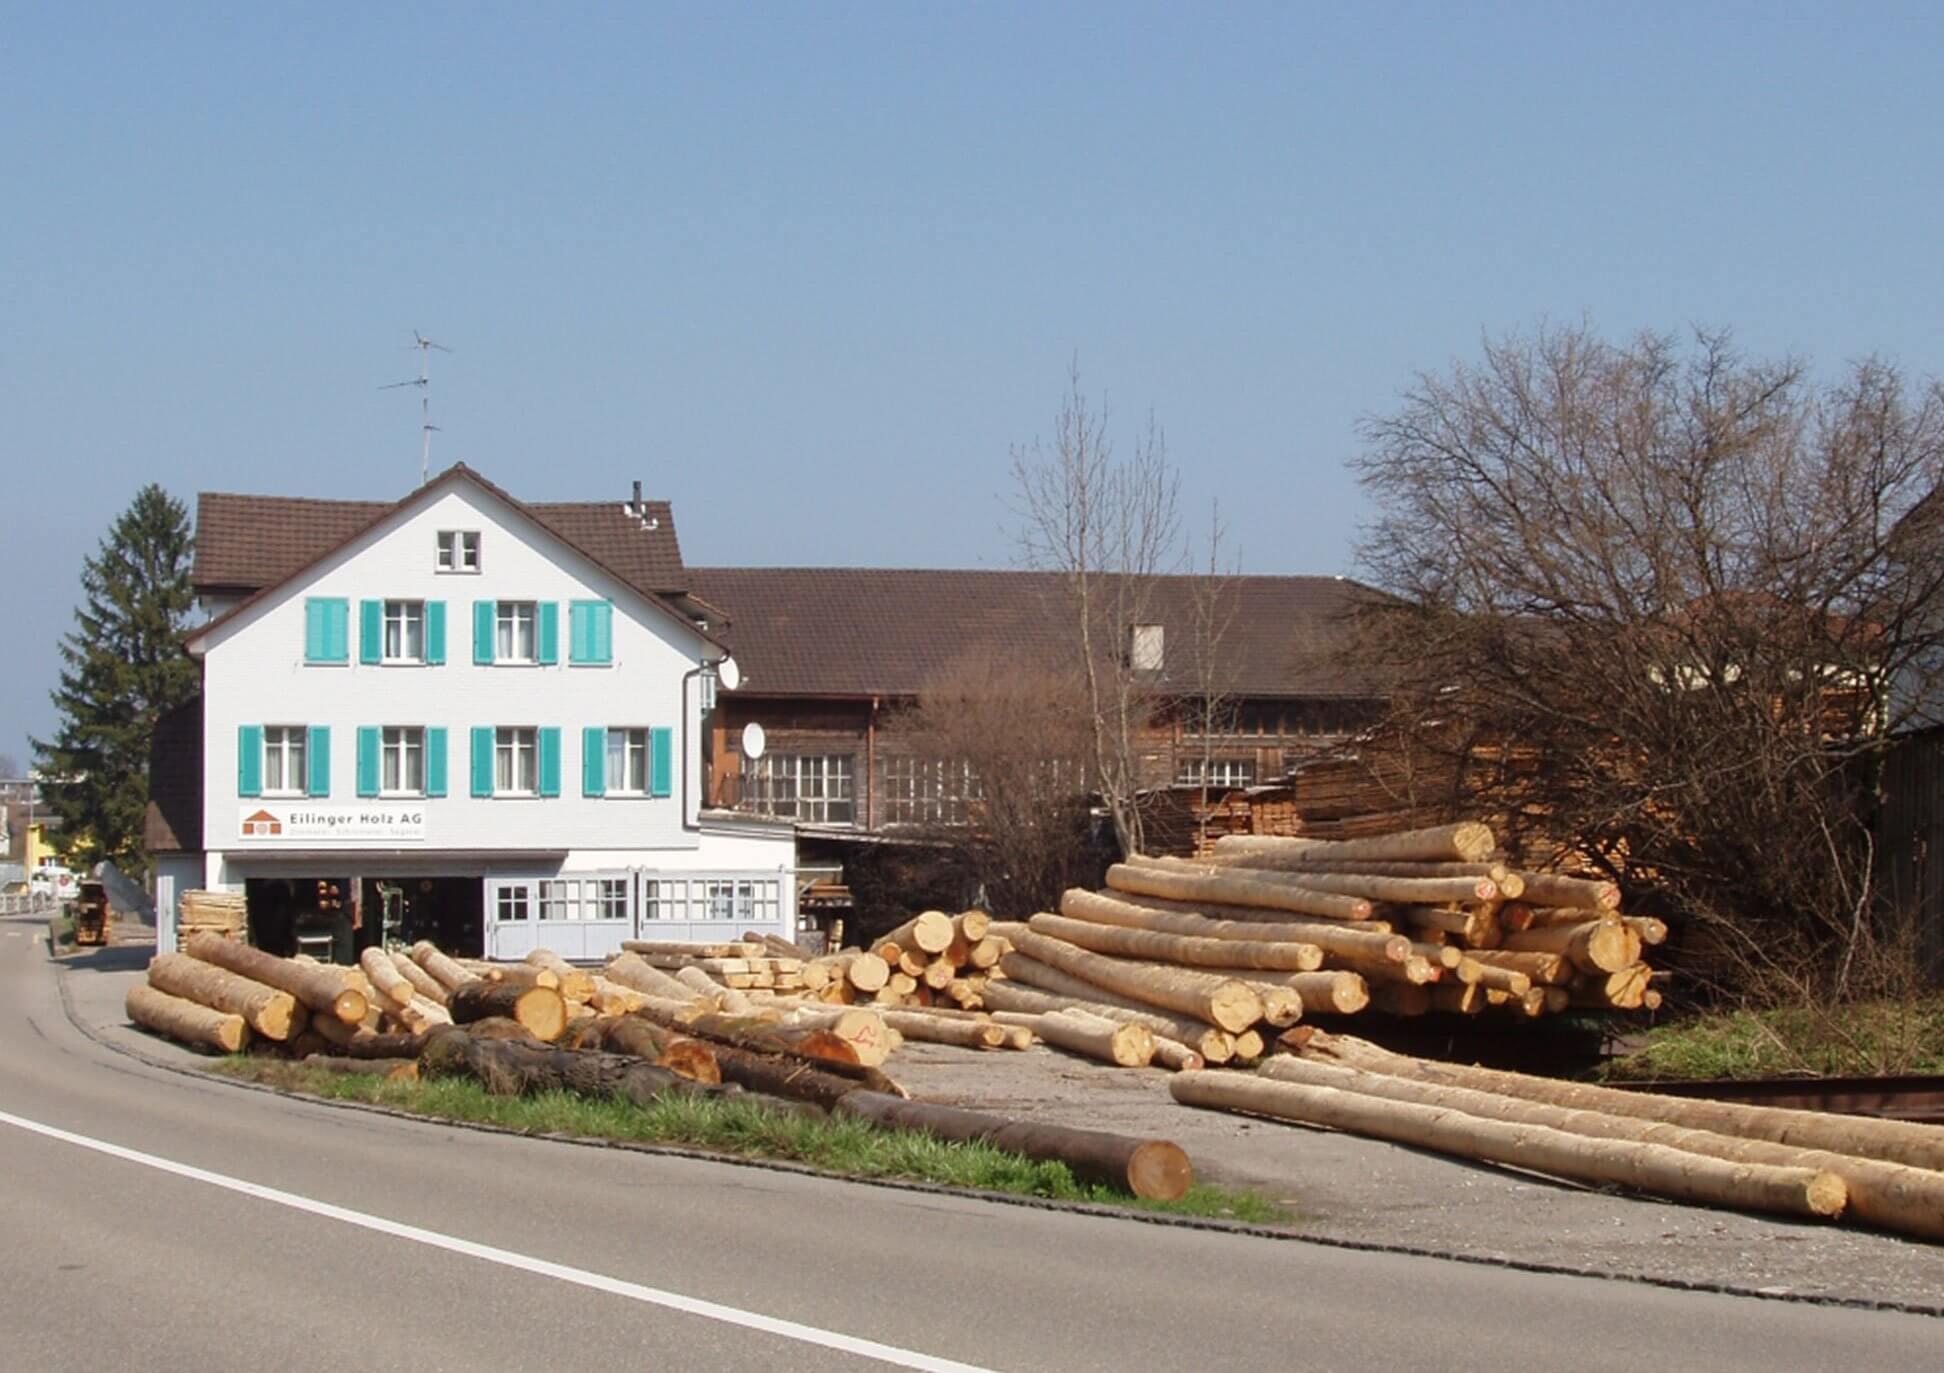 Eilinger Holz Goldach 2003